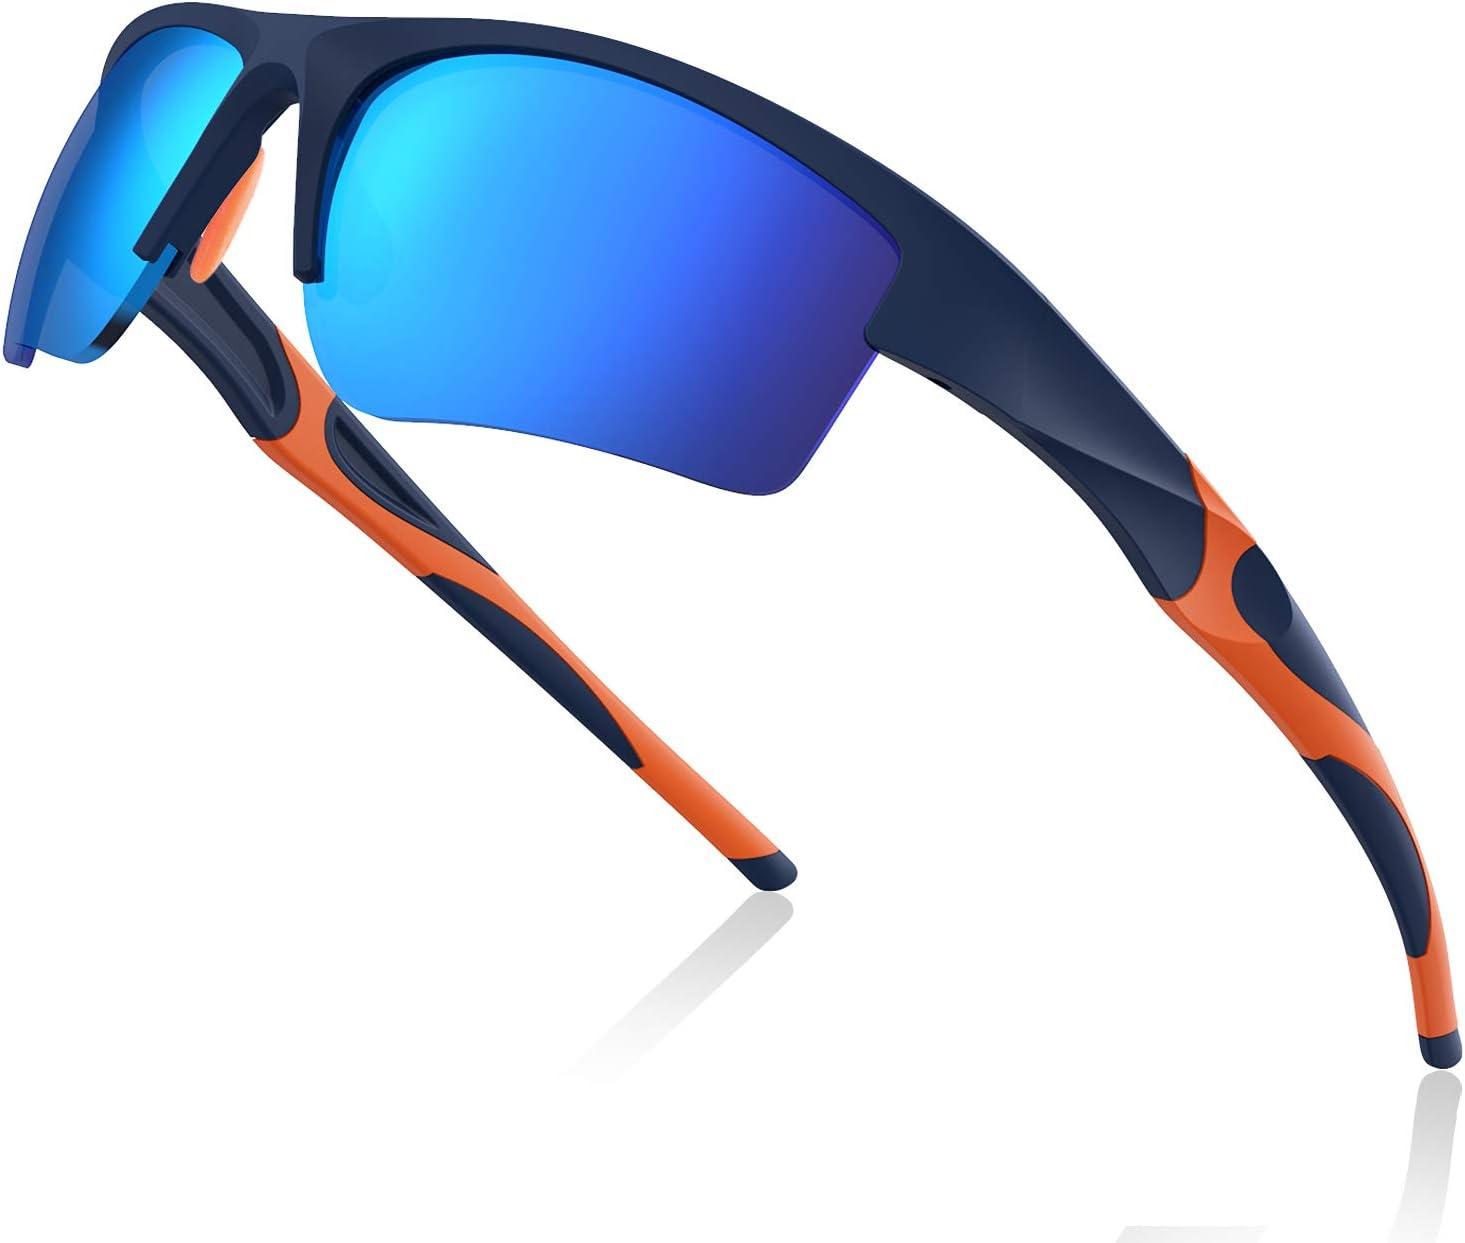 Avoalre Gafas de Sol Deportivas Hombre Gafas Hembra Unisex Conducto no polarizado TR90 Super Light UV400 Protección Certificado CE para Ciclismo MTB Running Coche Moto Montaña